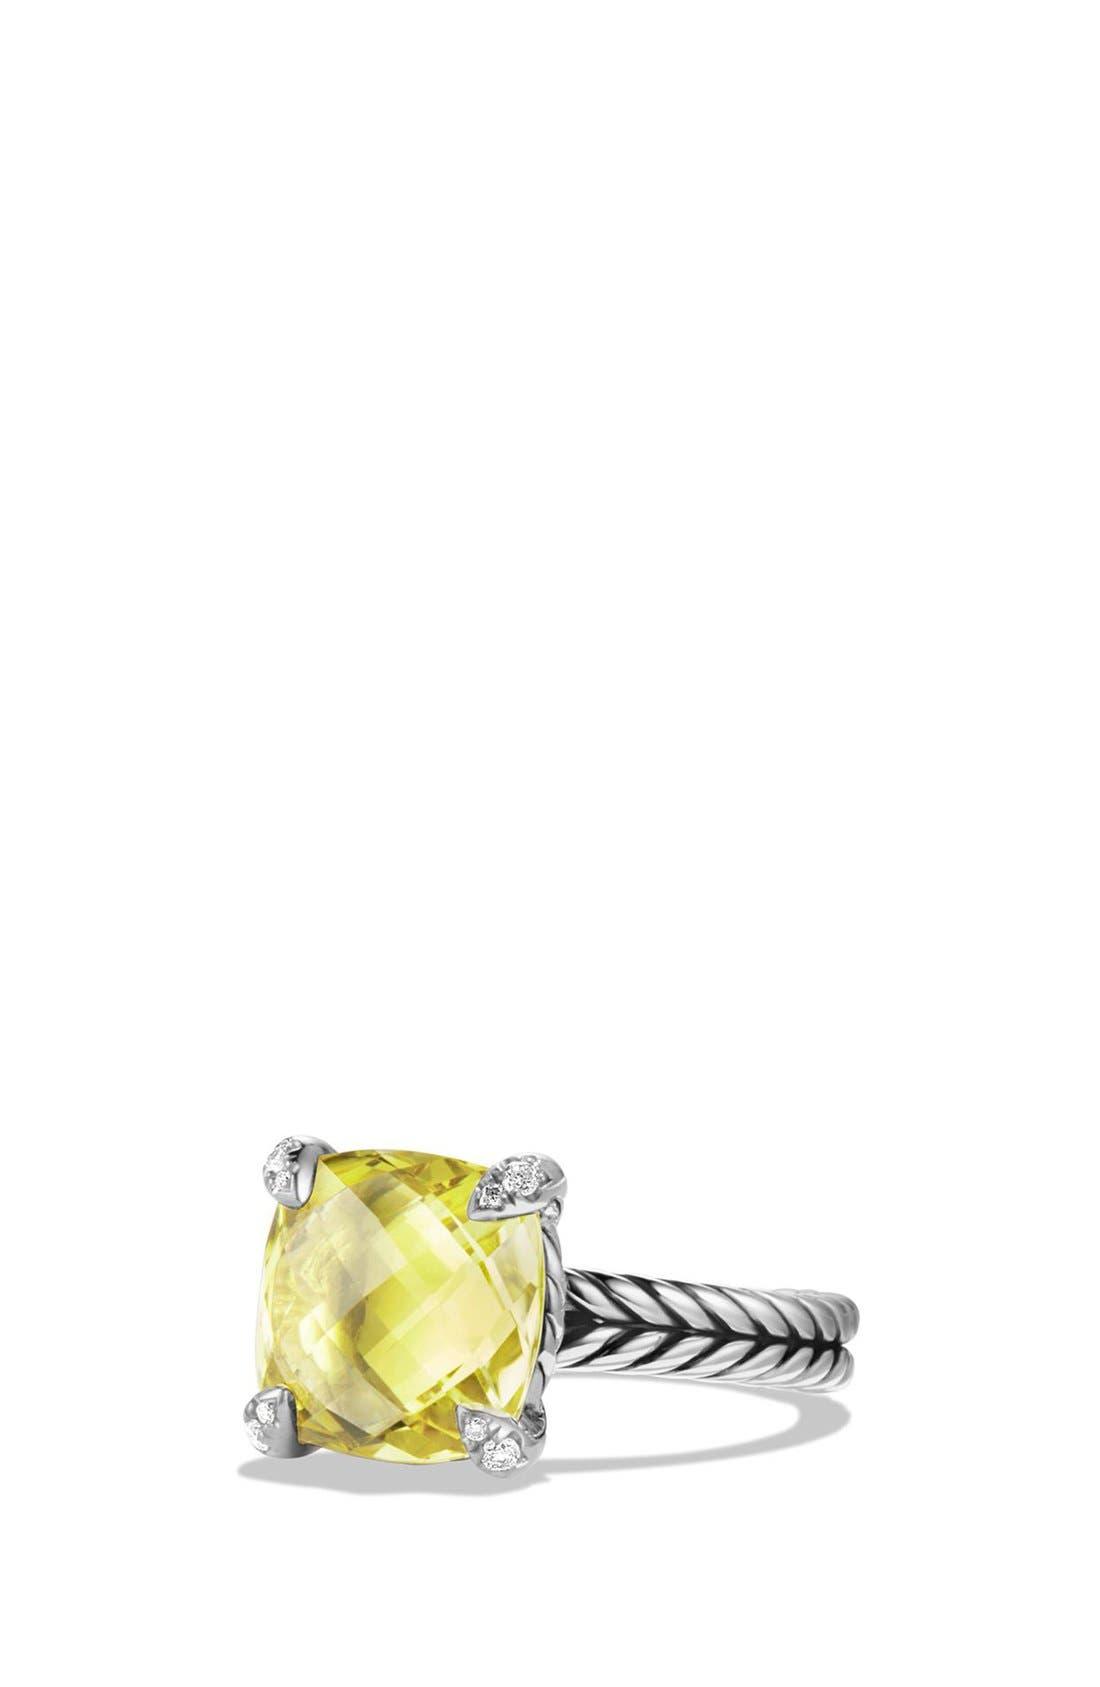 David Yurman 'Châtelaine' Ring with Semiprecious Stone and Diamonds